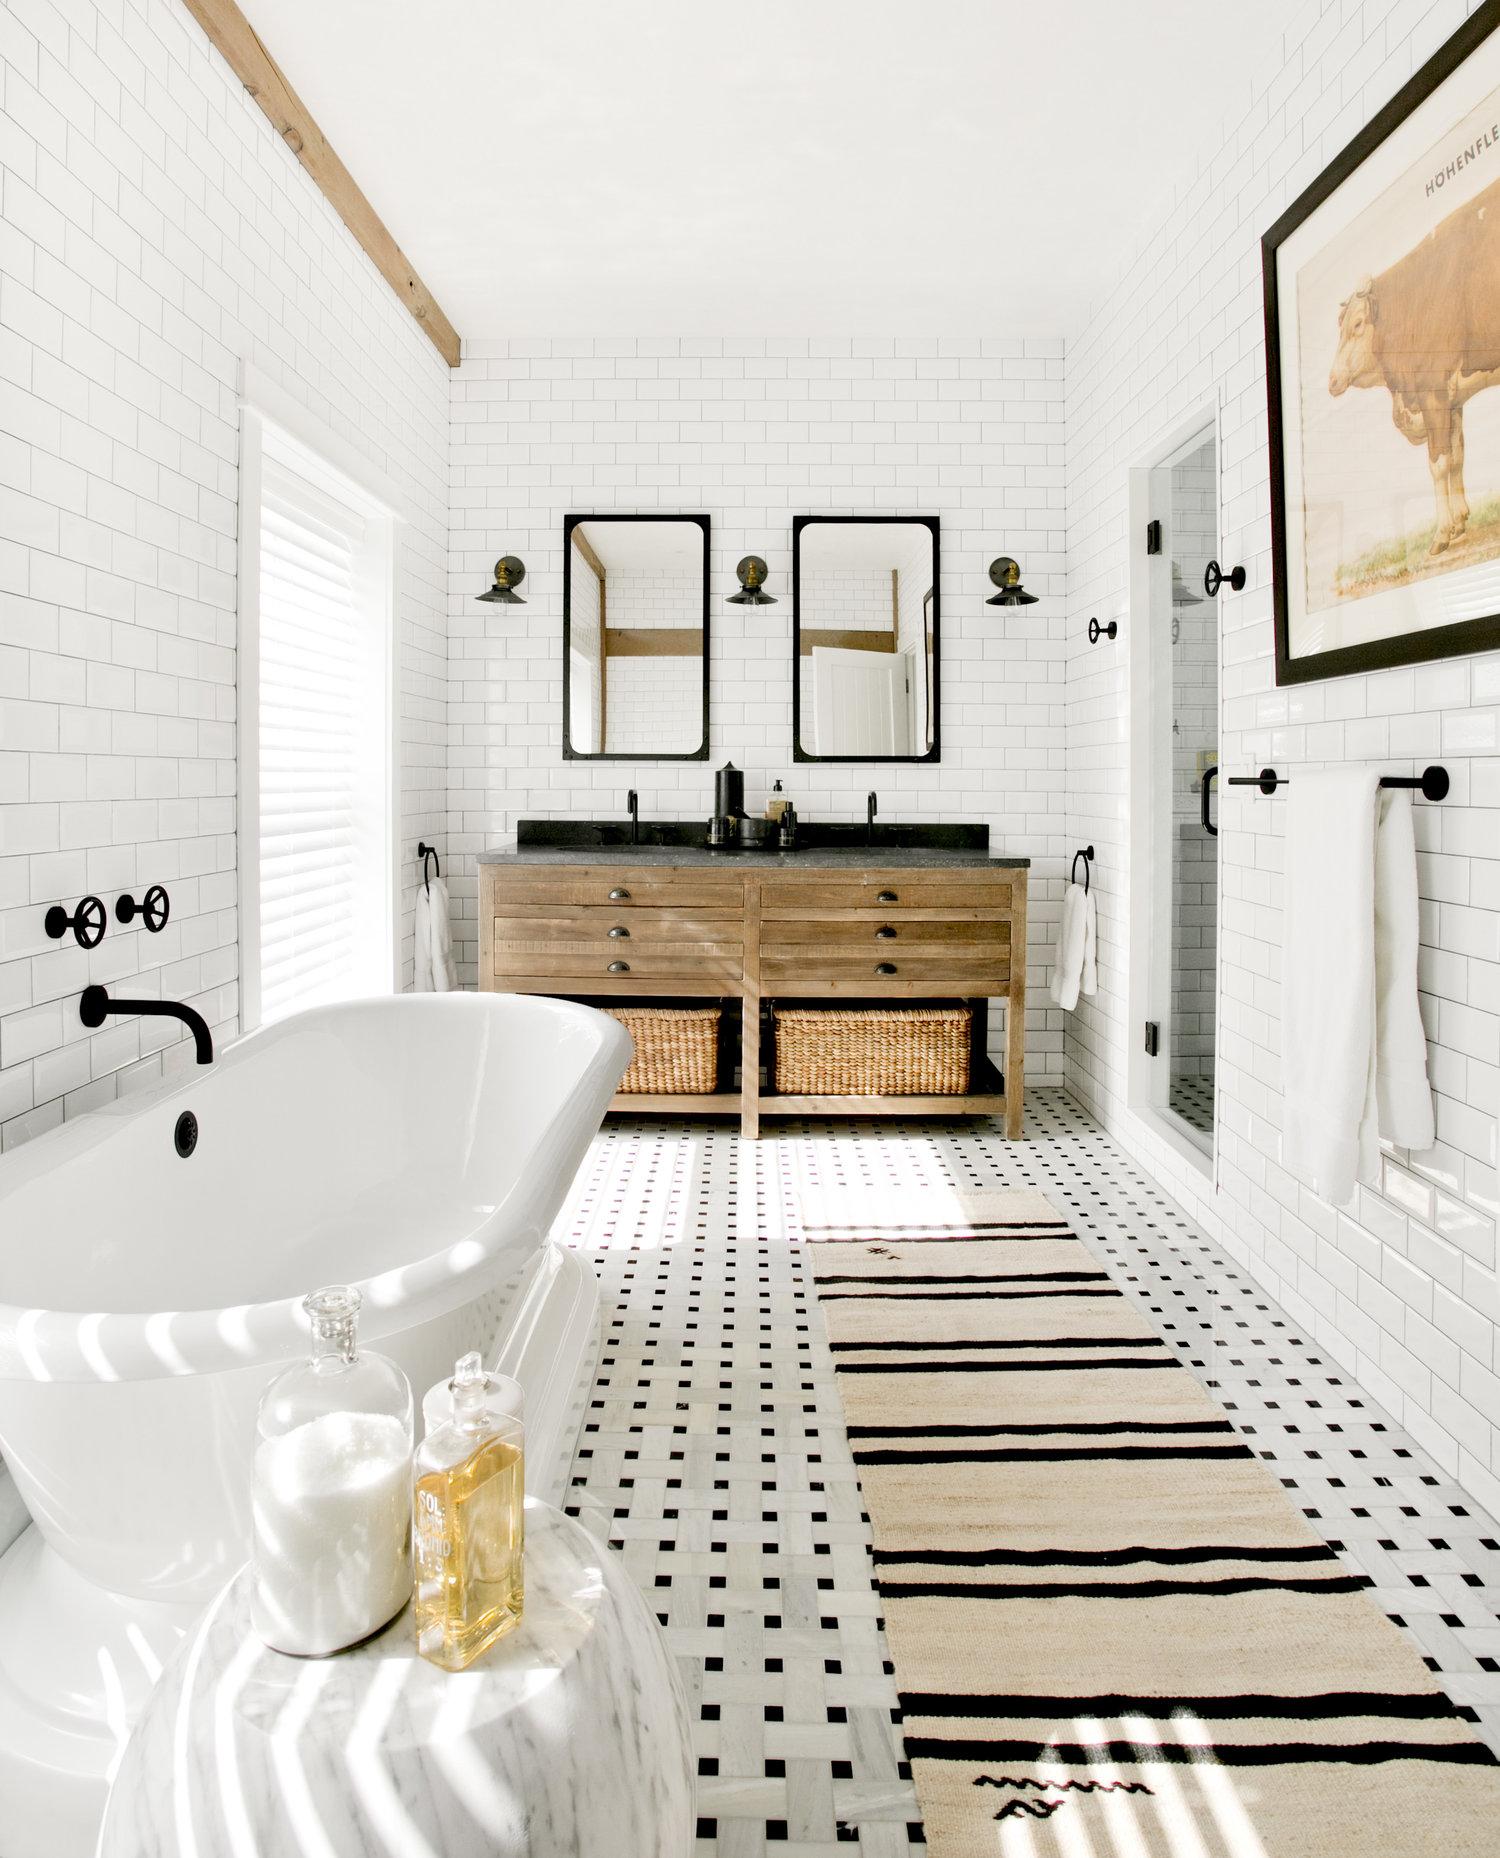 ванная комната душевая кабина двойная раковина зеркало комод ванна плитка кабанчик окно